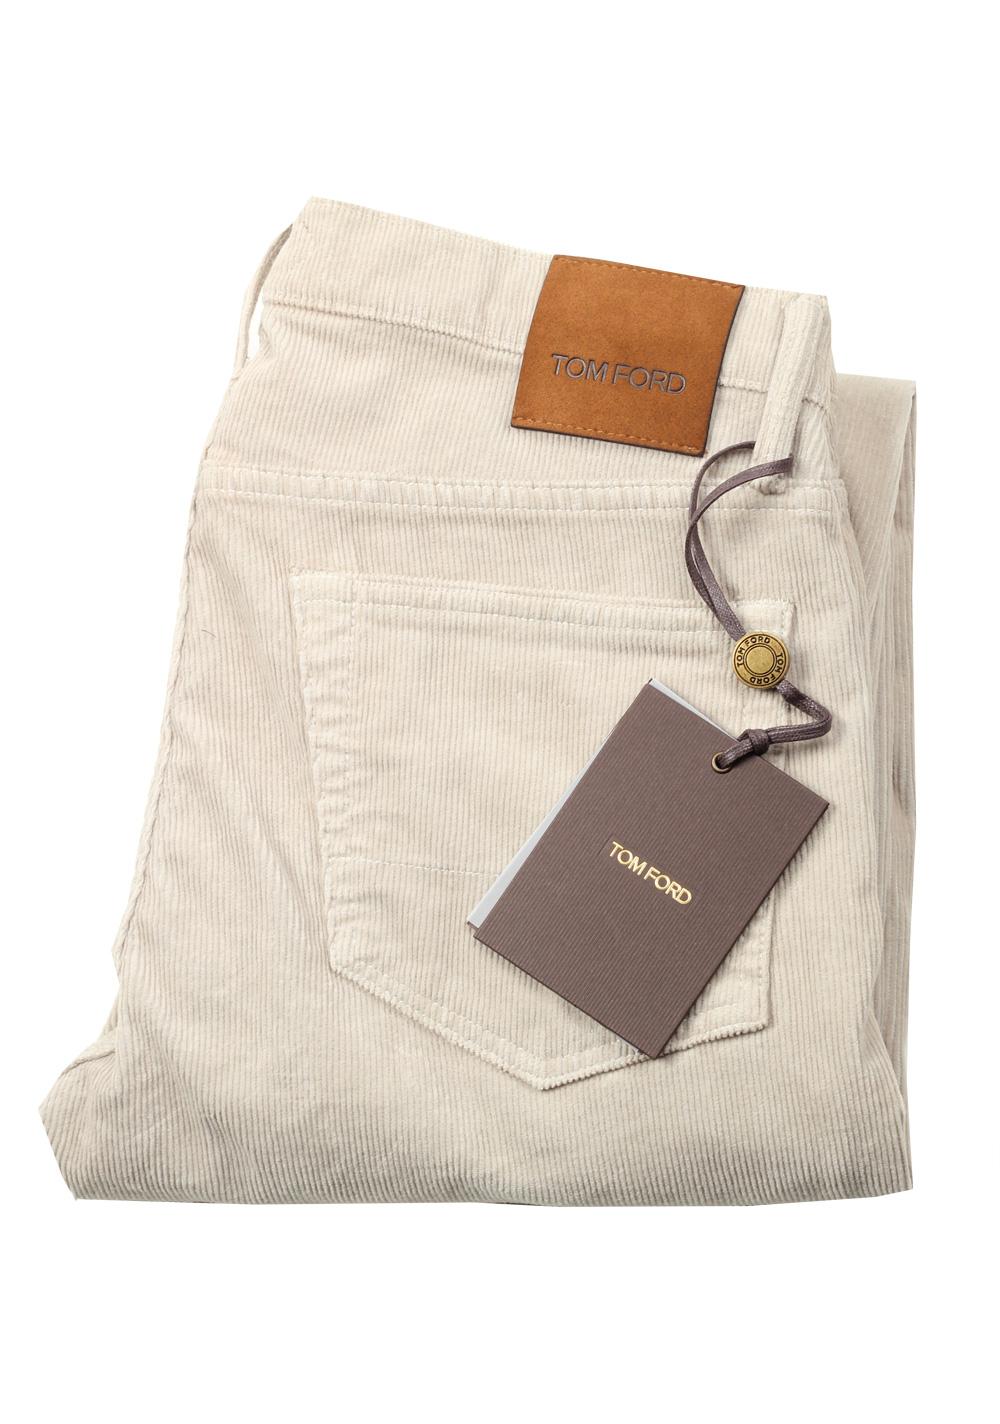 TOM FORD Slim Beige Jeans TFD001 Size 54 / 38 U.S.   Costume Limité